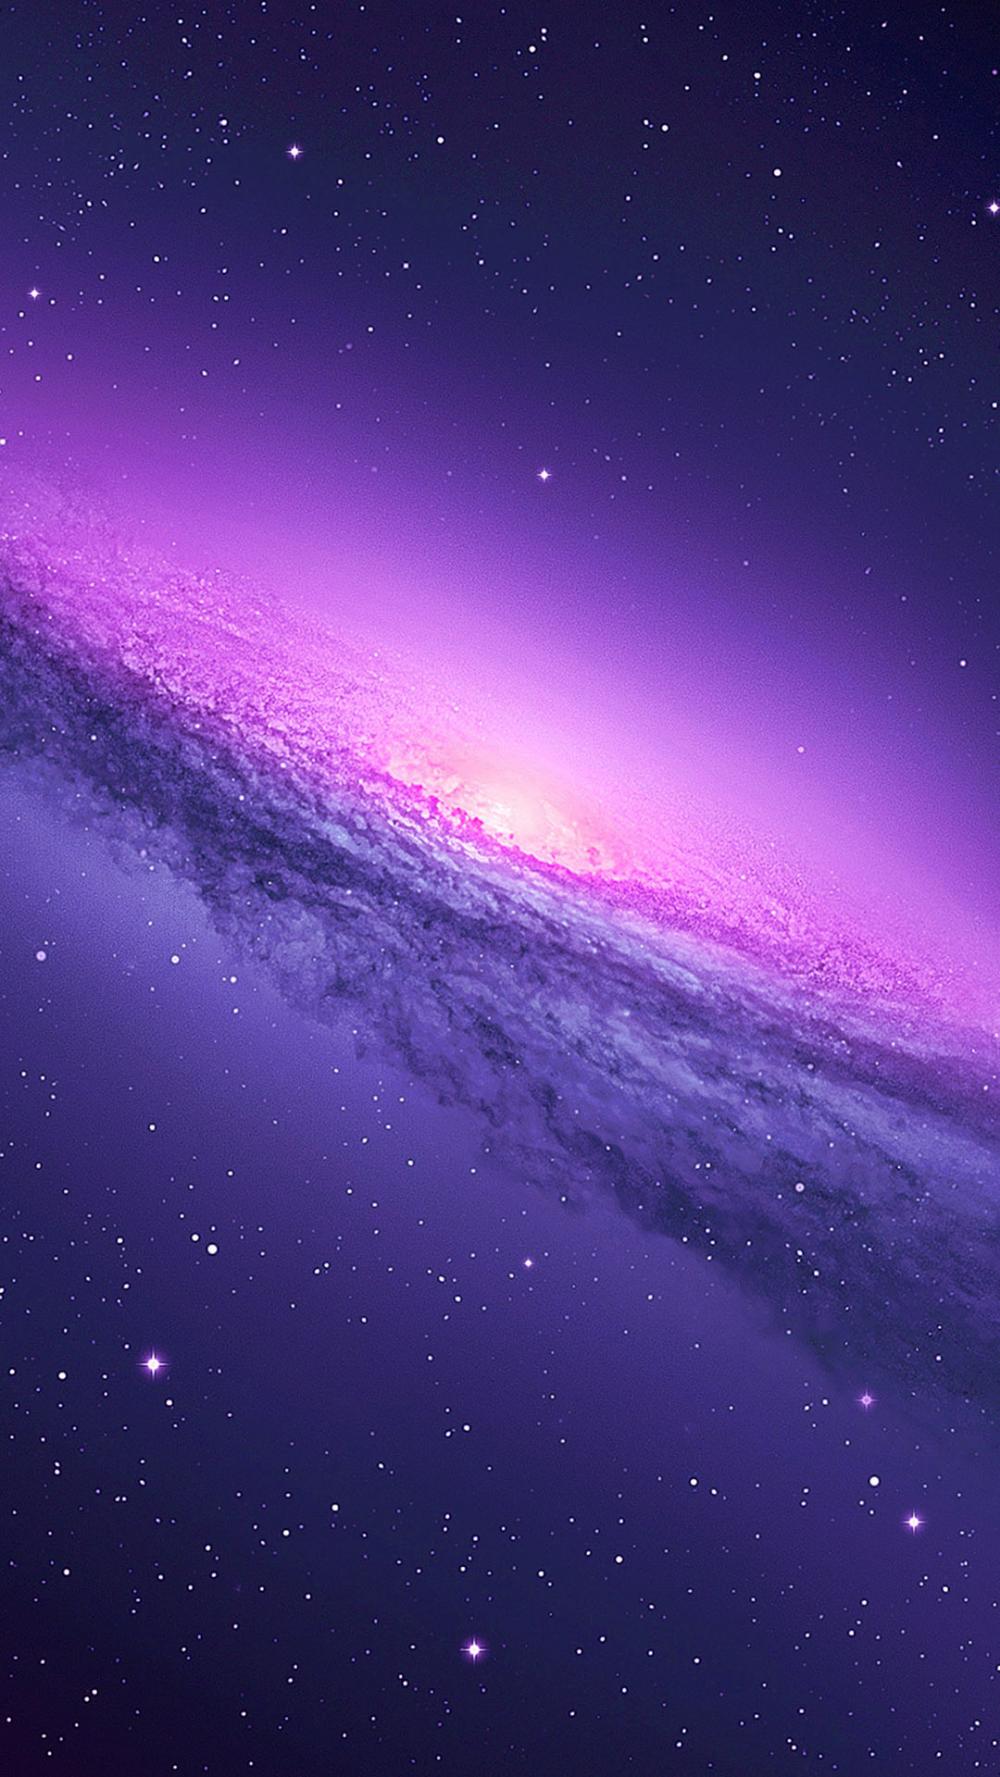 Free Download The Purple Galaxy Wallpaper Beaty Your Iphone Outer Galaxy Star Wa Purple Galaxy Wallpaper Iphone 6 Wallpaper Backgrounds Galaxy Wallpaper